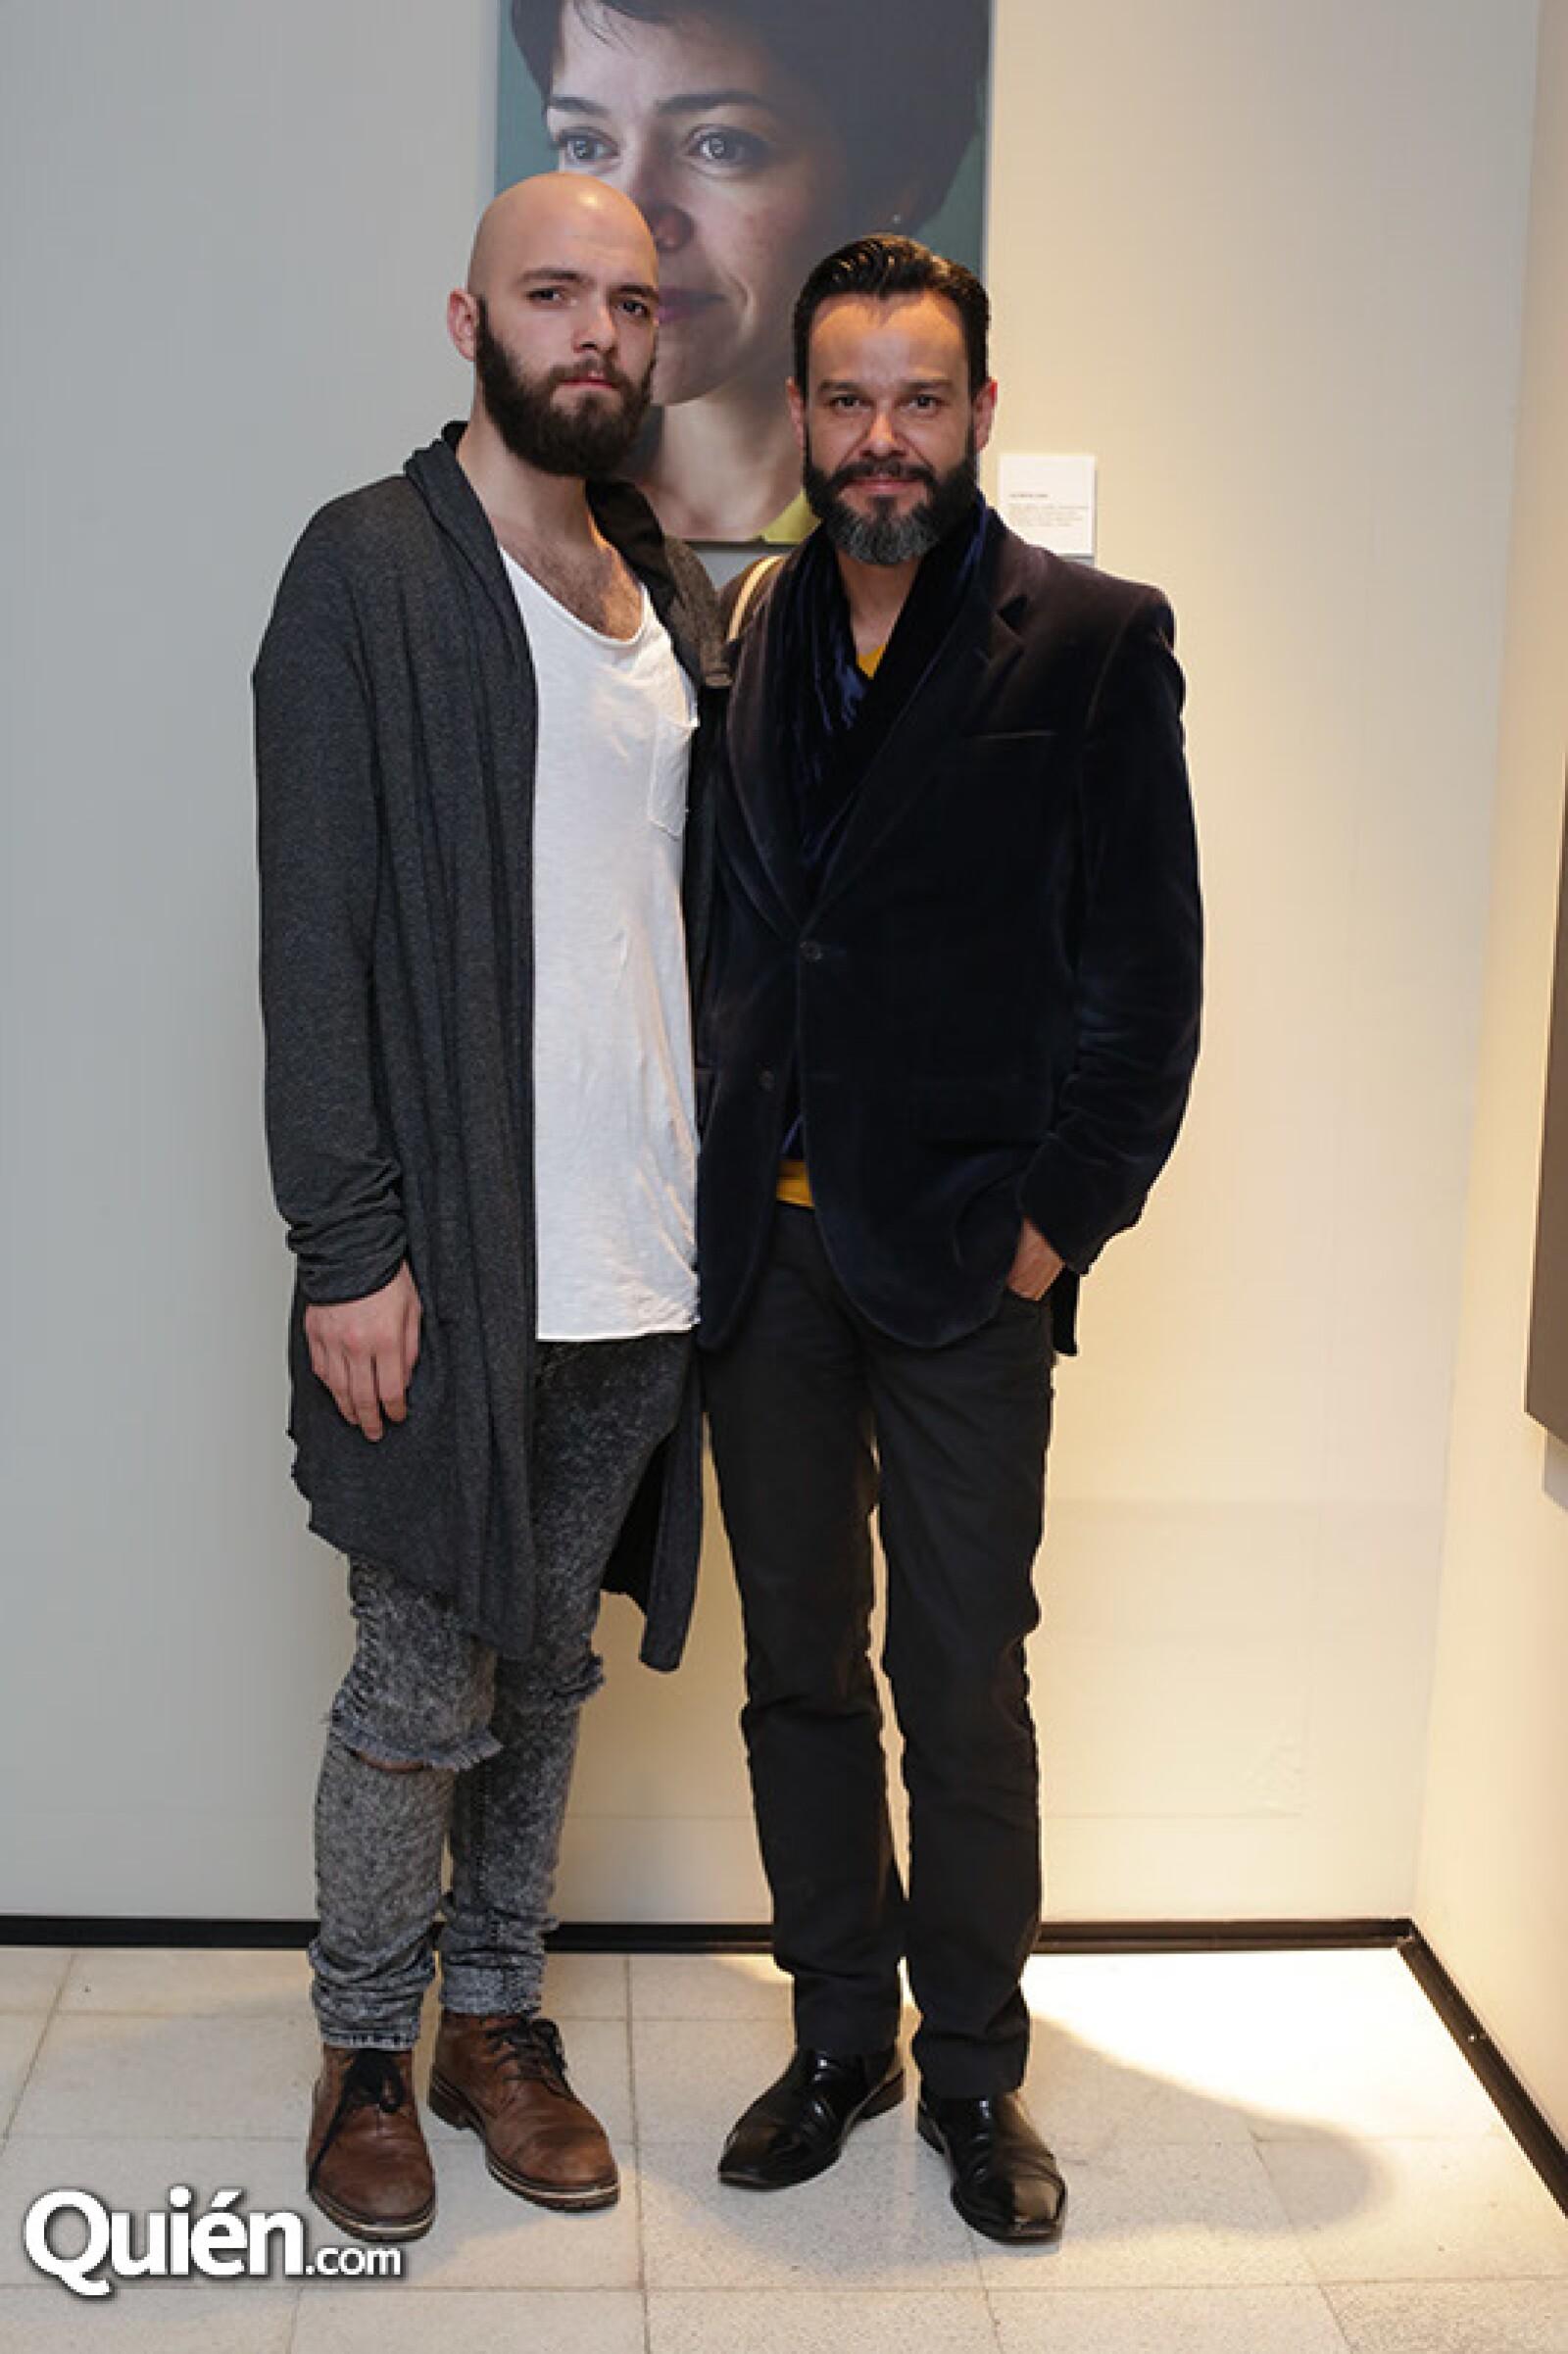 Leonardo Floresvillar y Jorge Medina